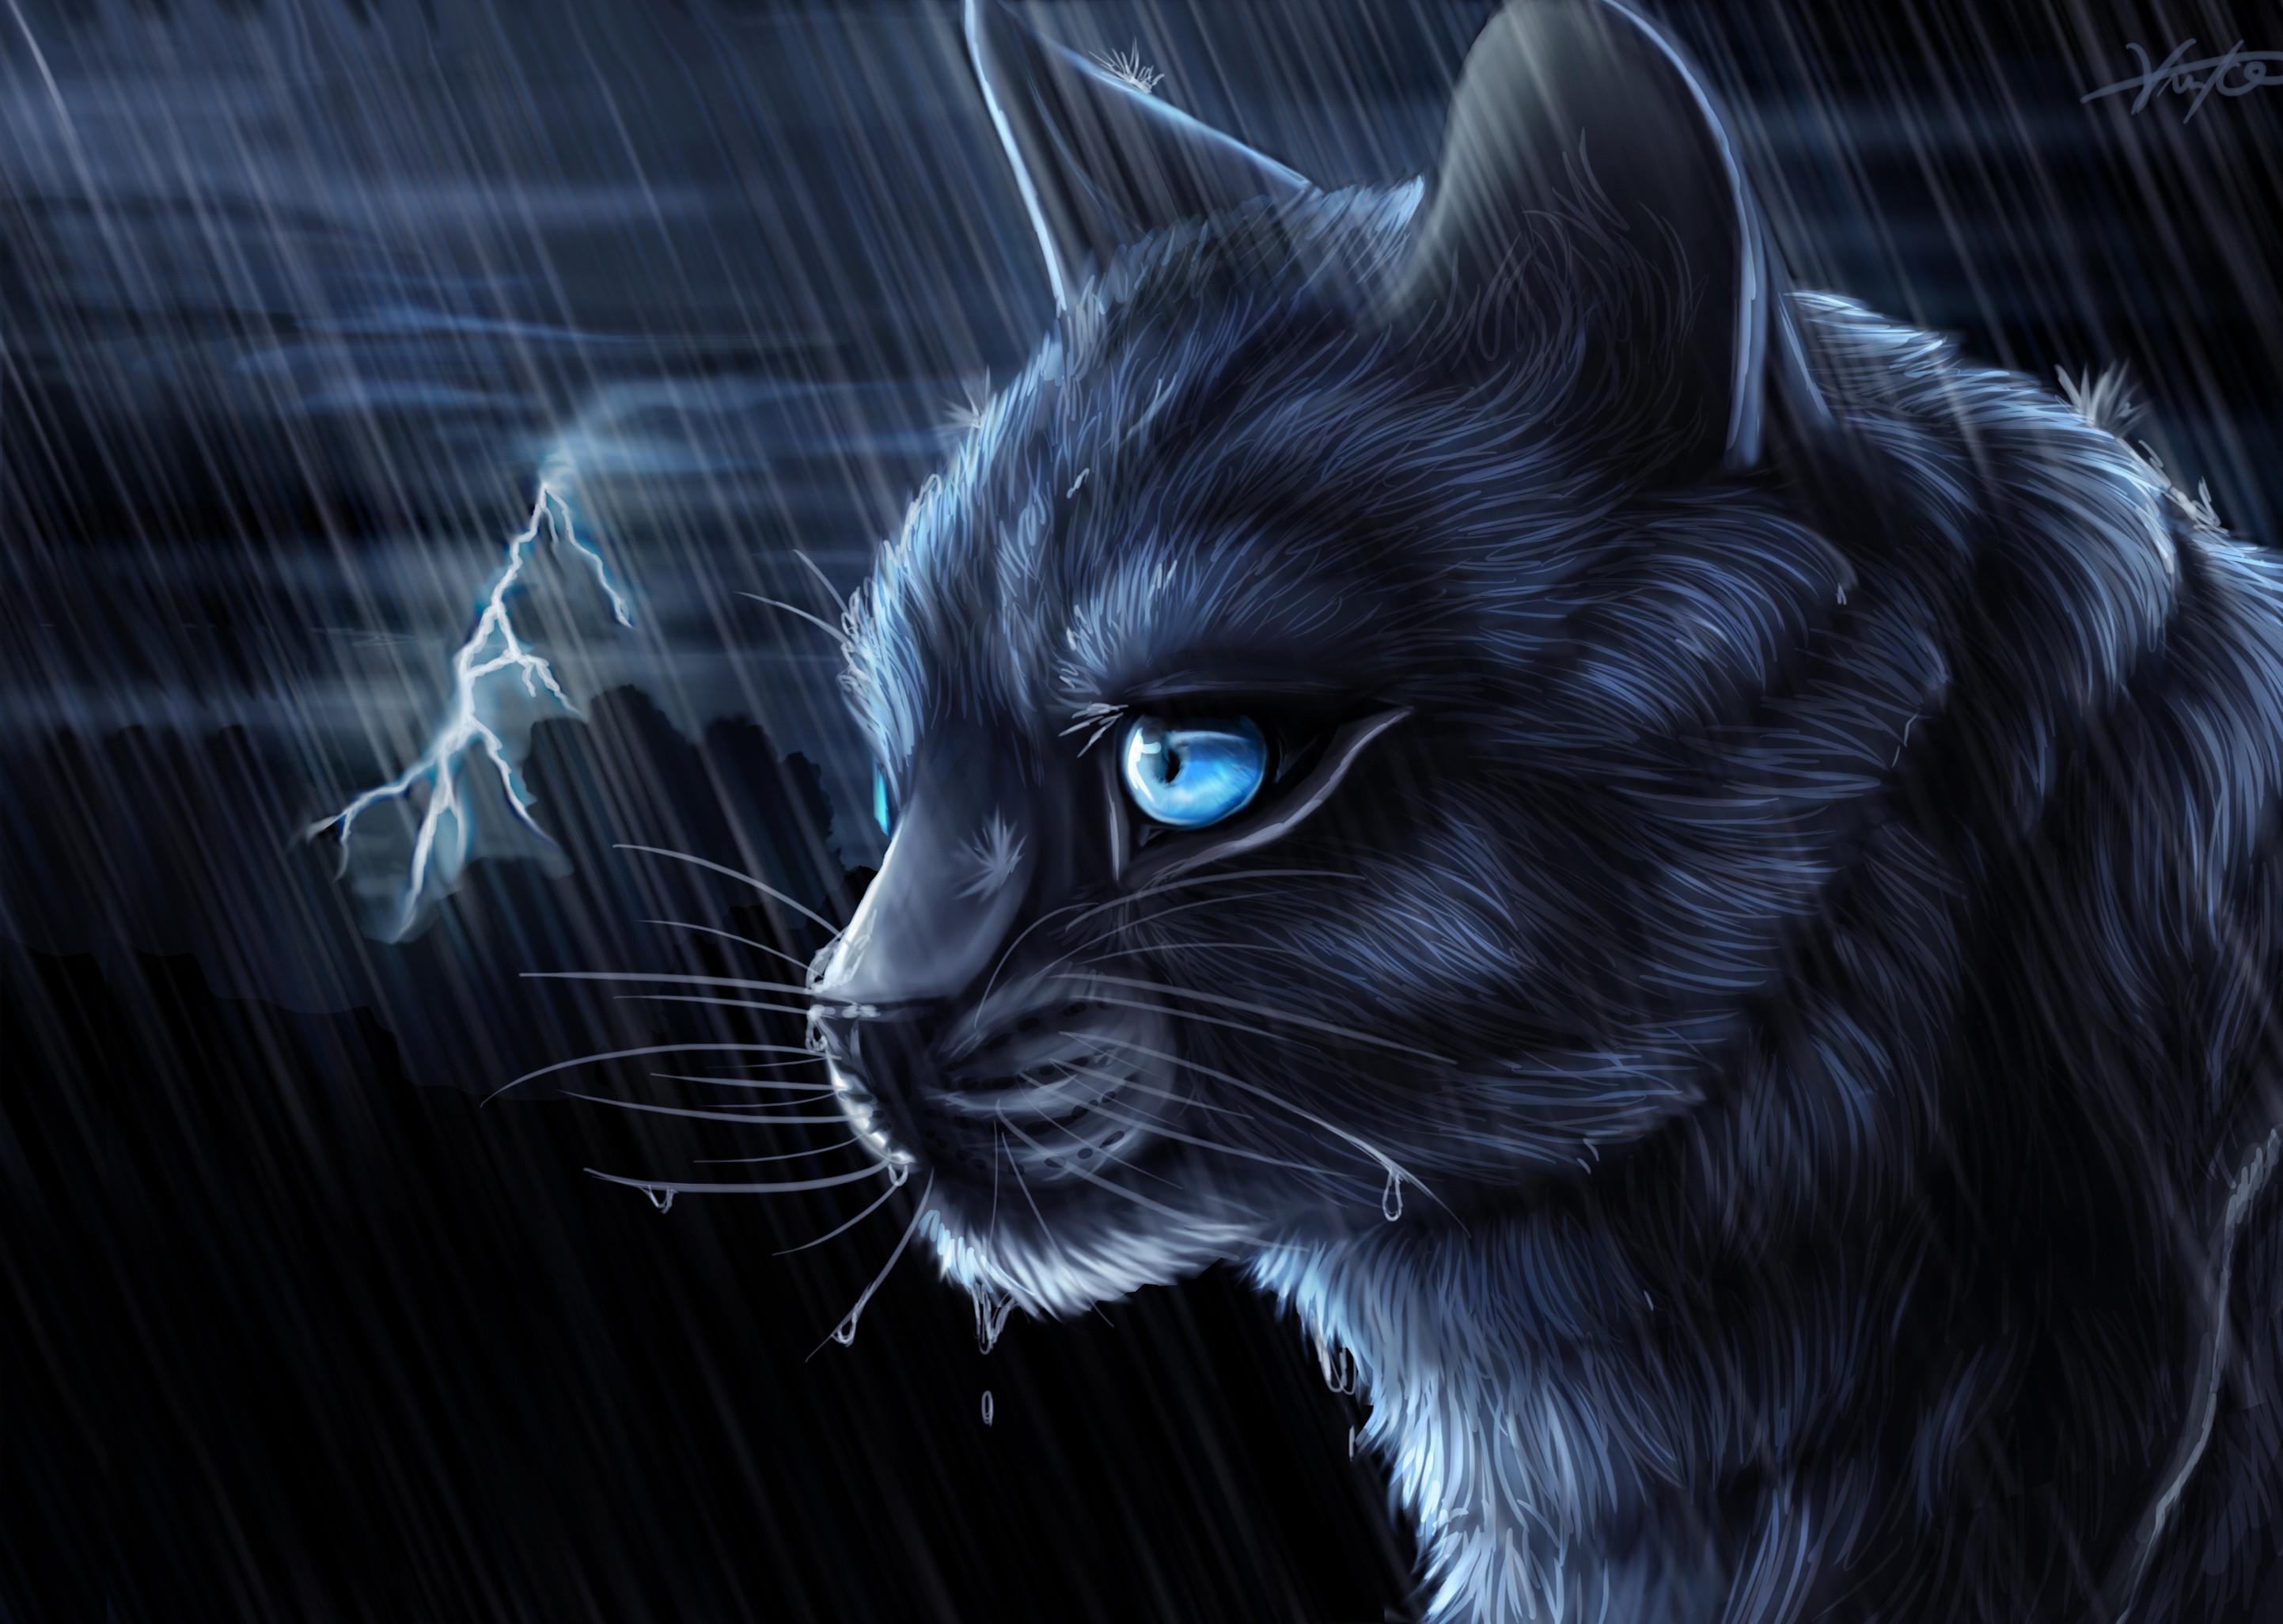 warriorcats